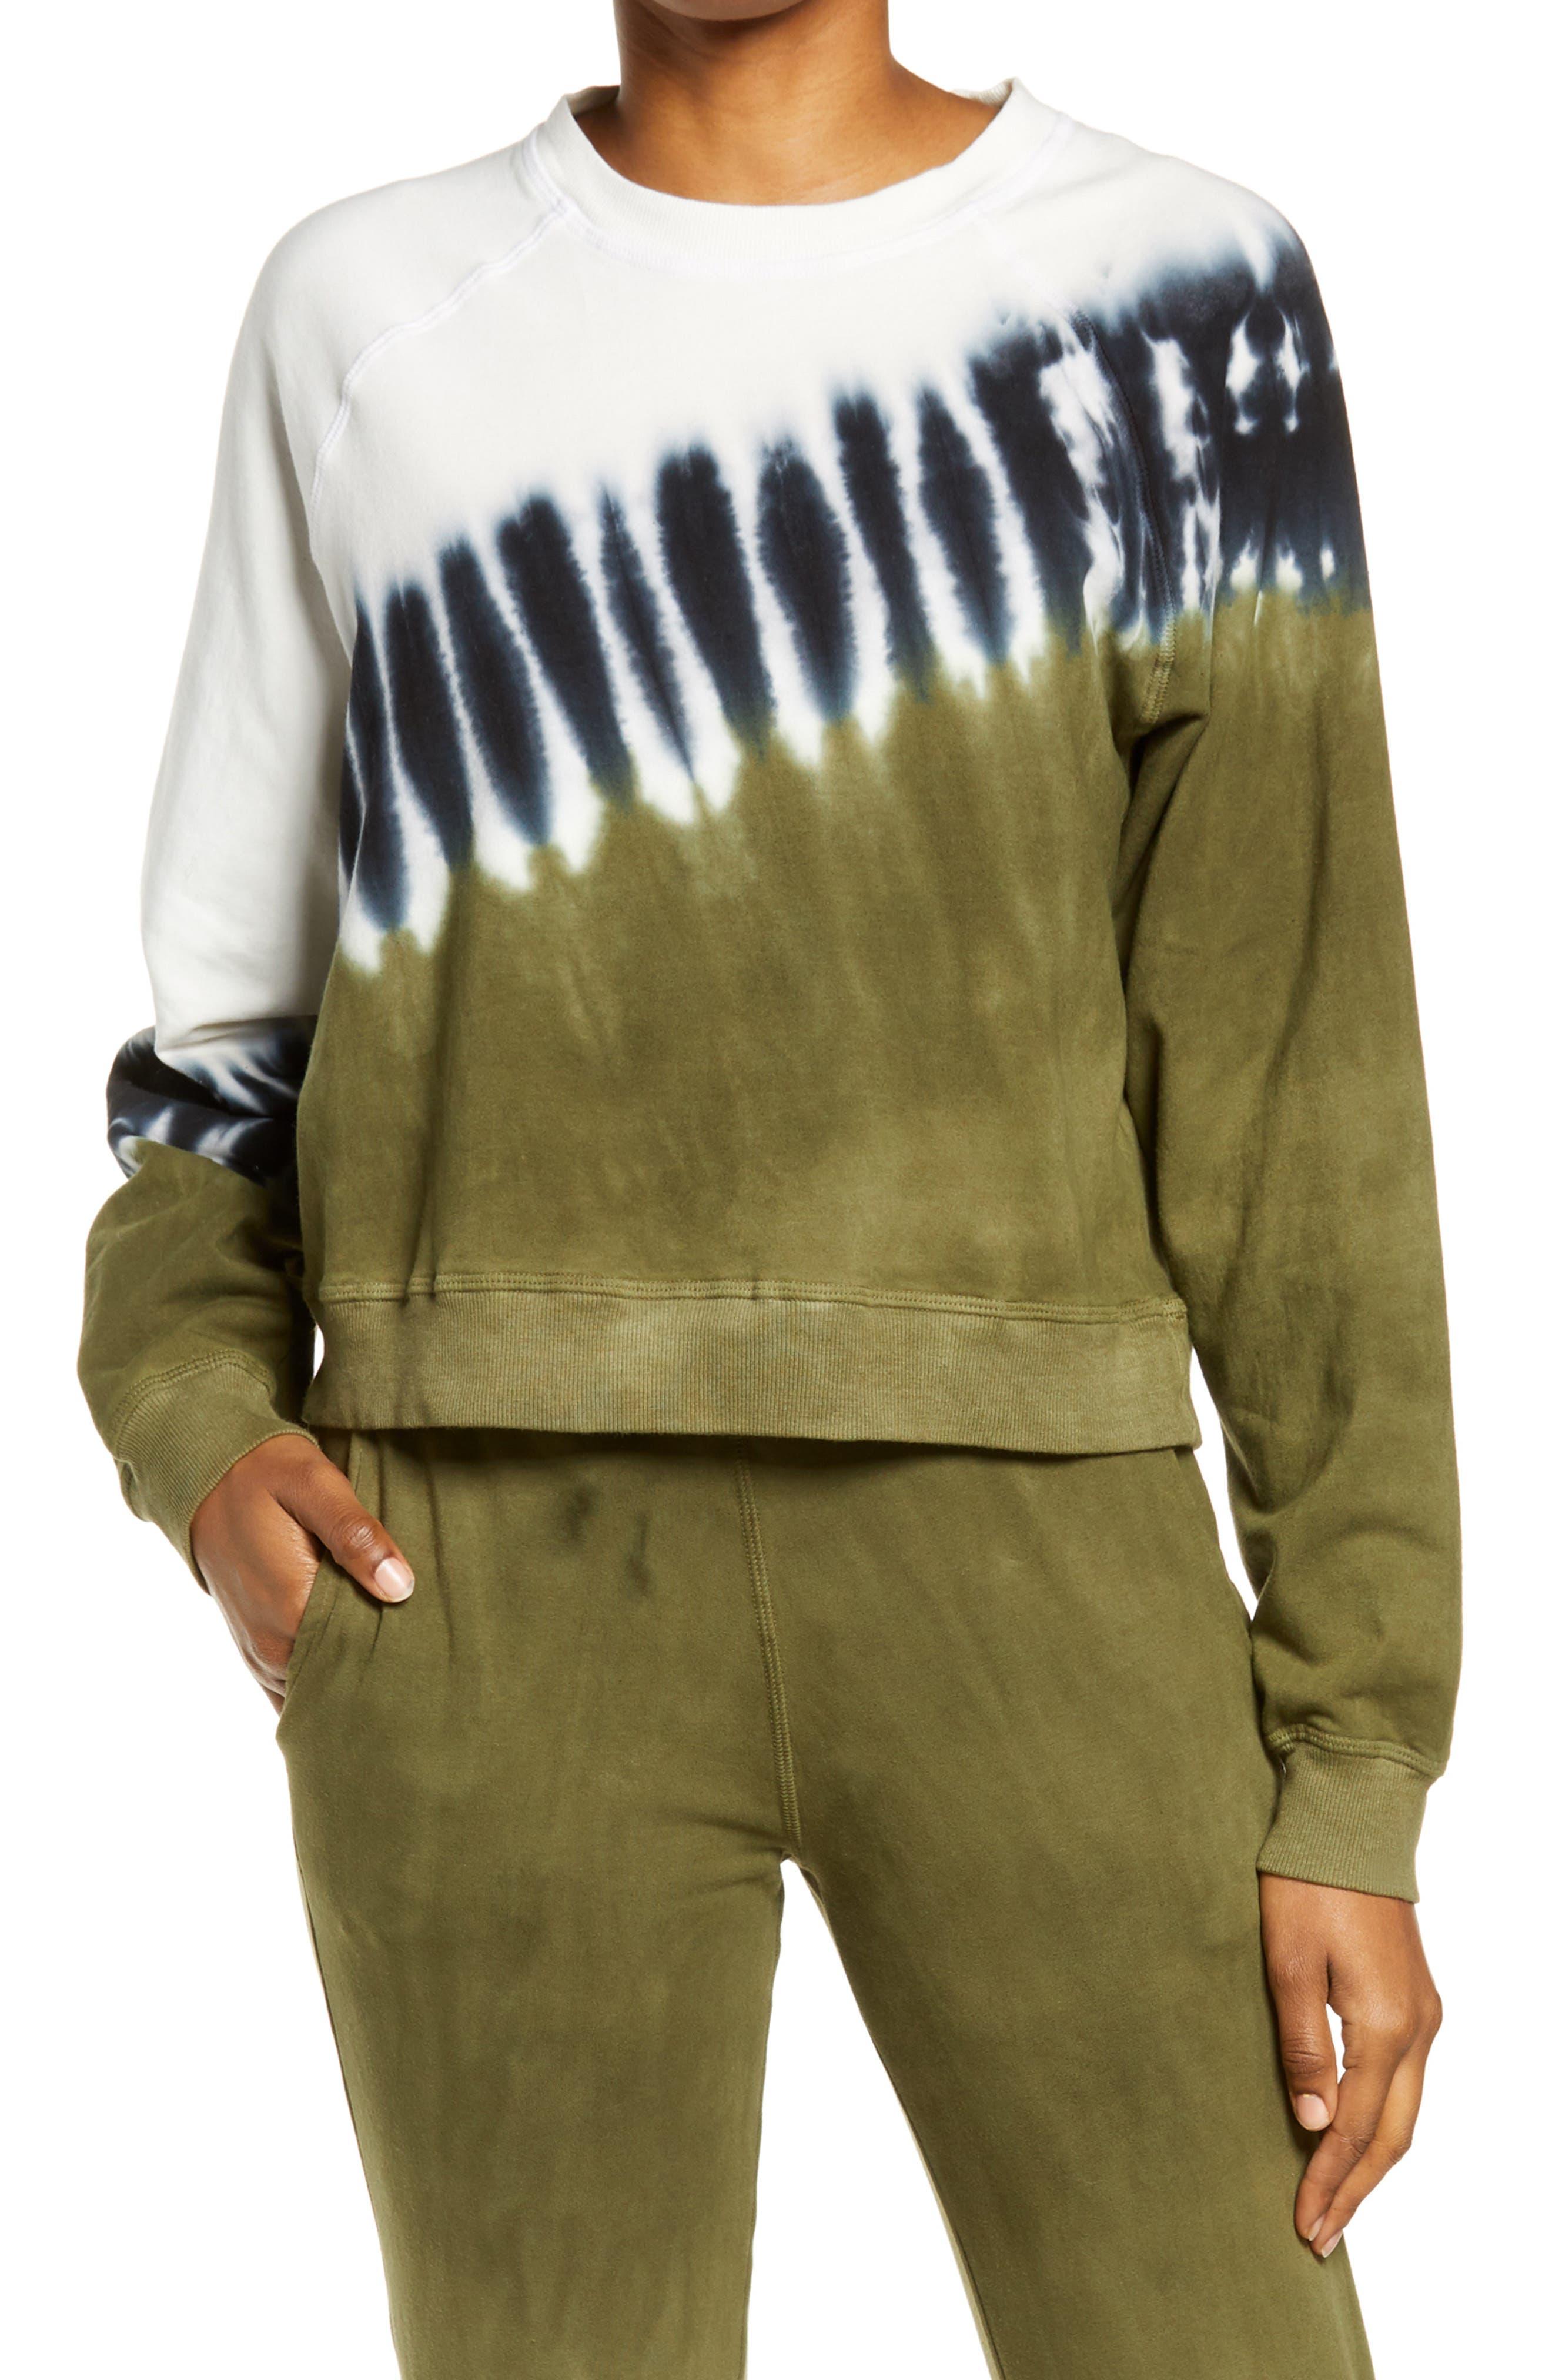 Ronan Crest Tie Dye Pullover